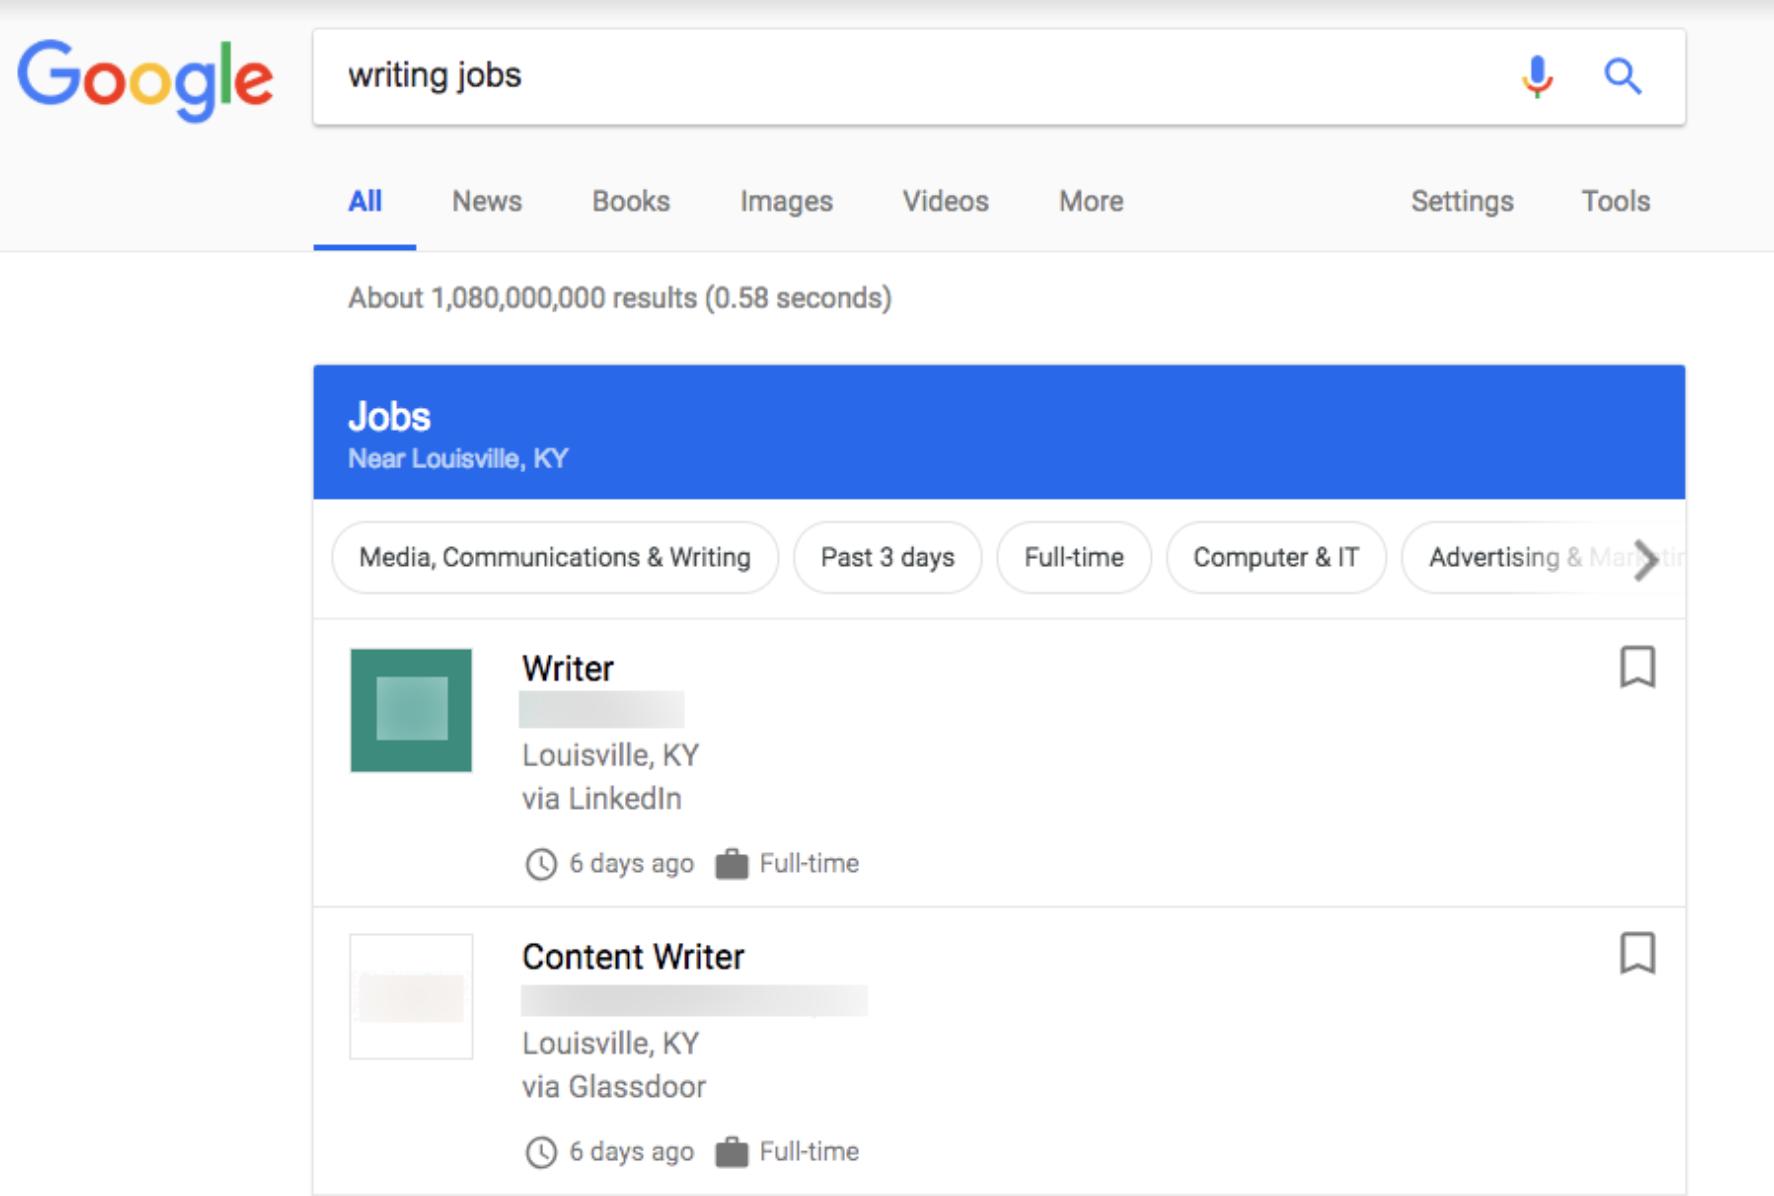 Job Search on Google